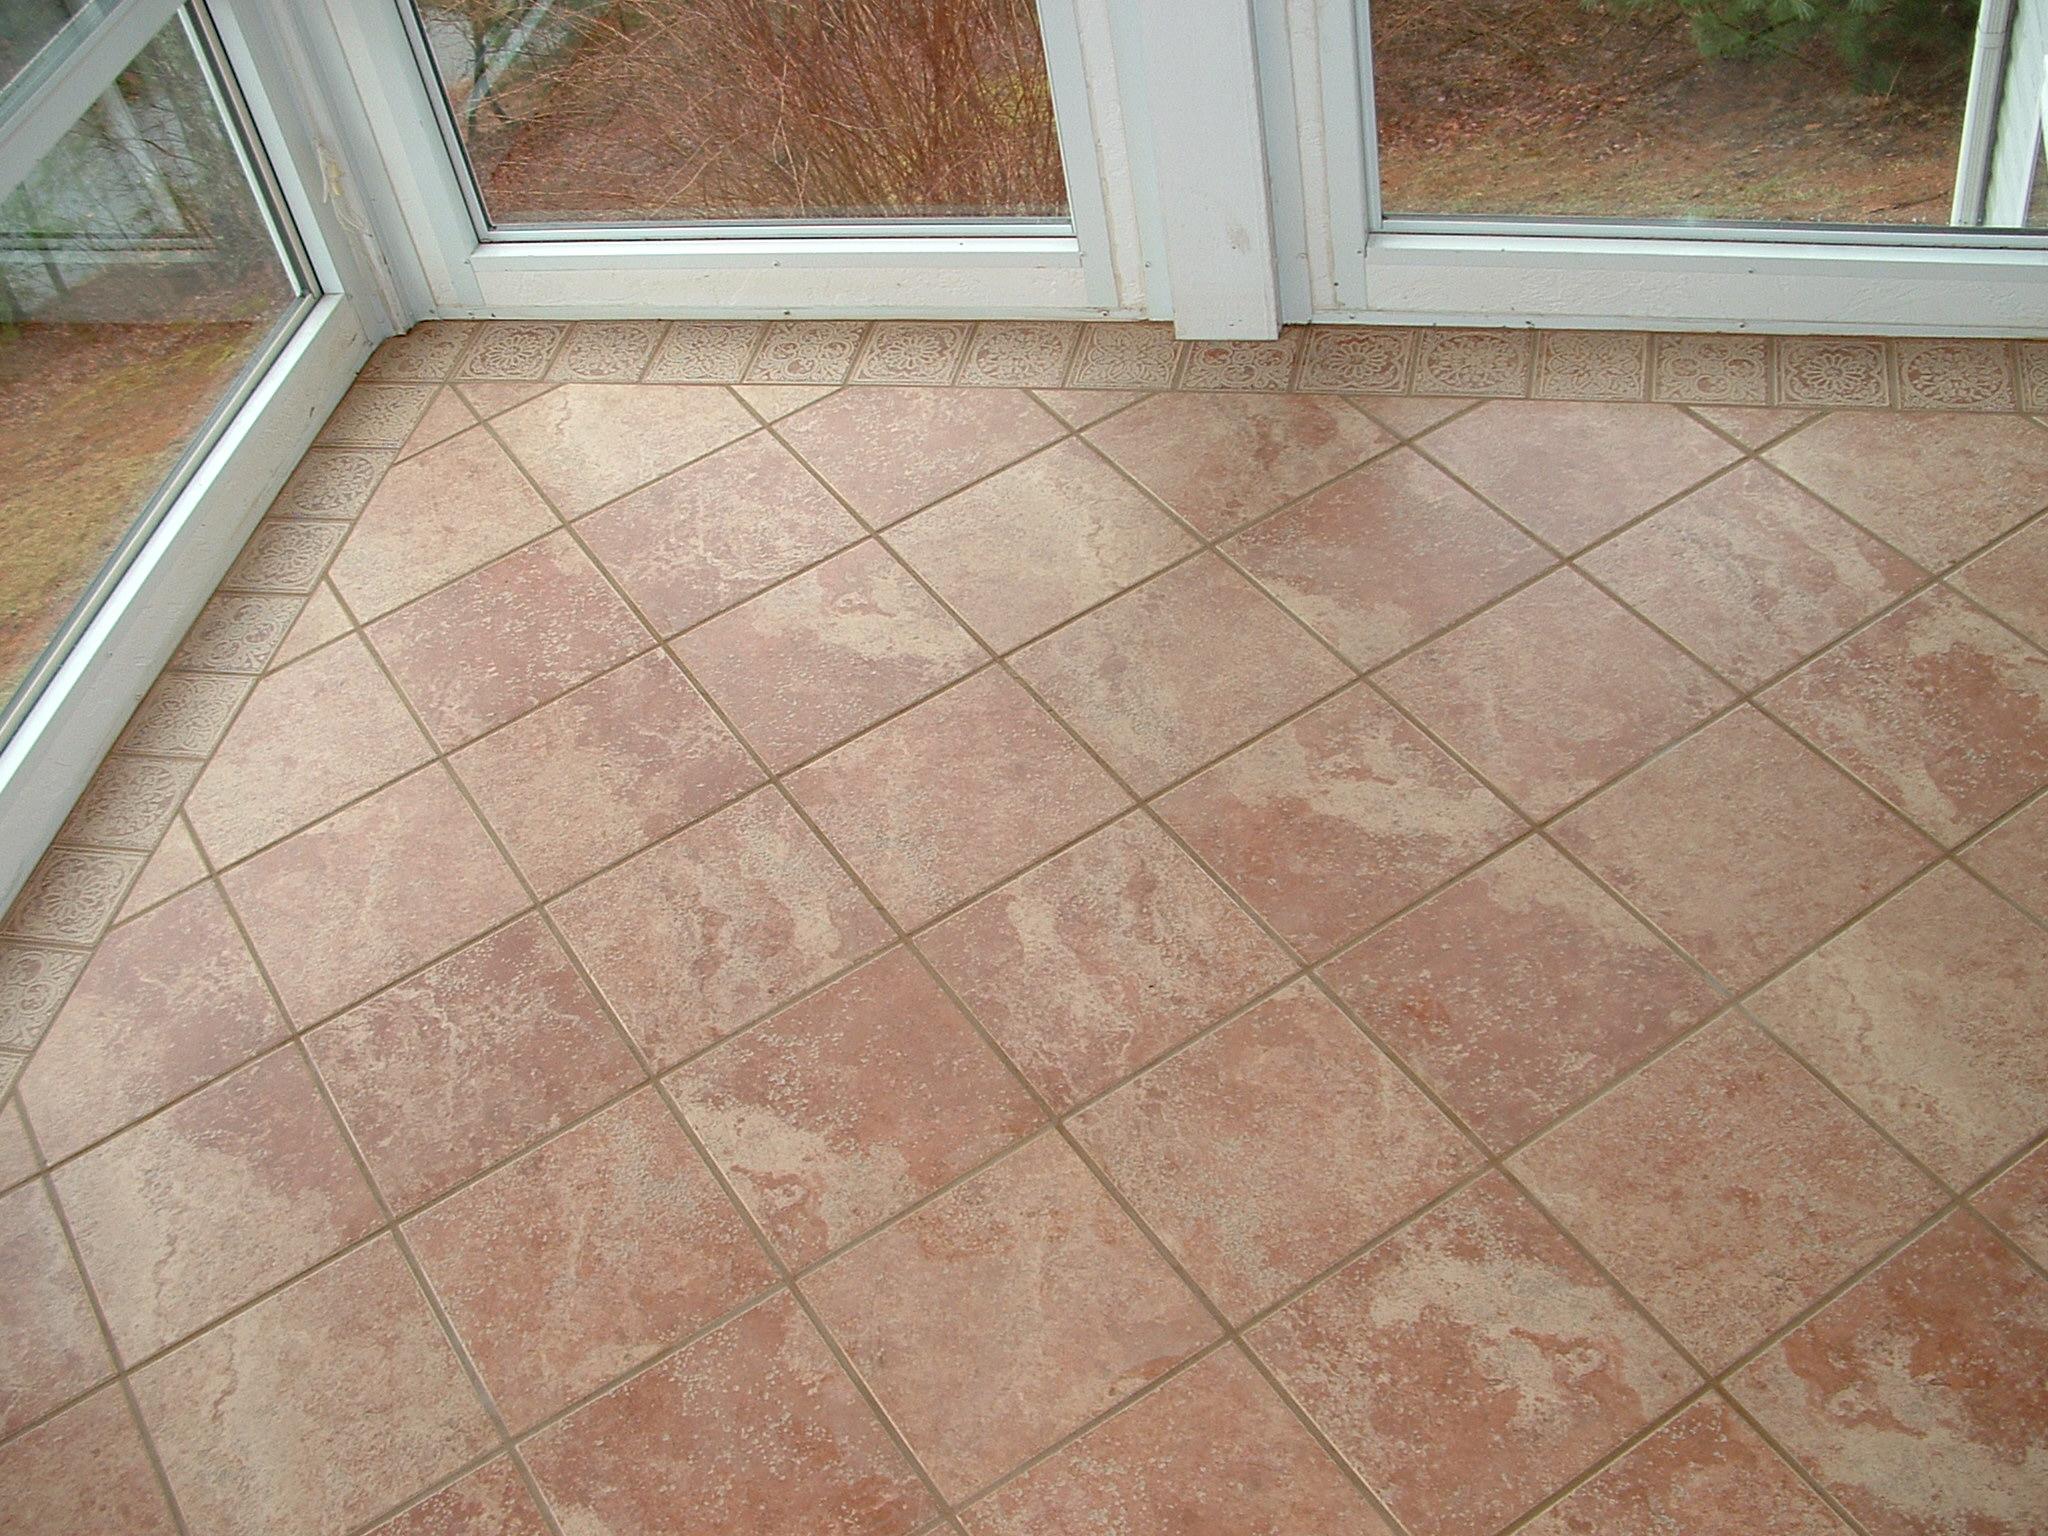 Awful Tile Work or Not?-dscf0677.jpg